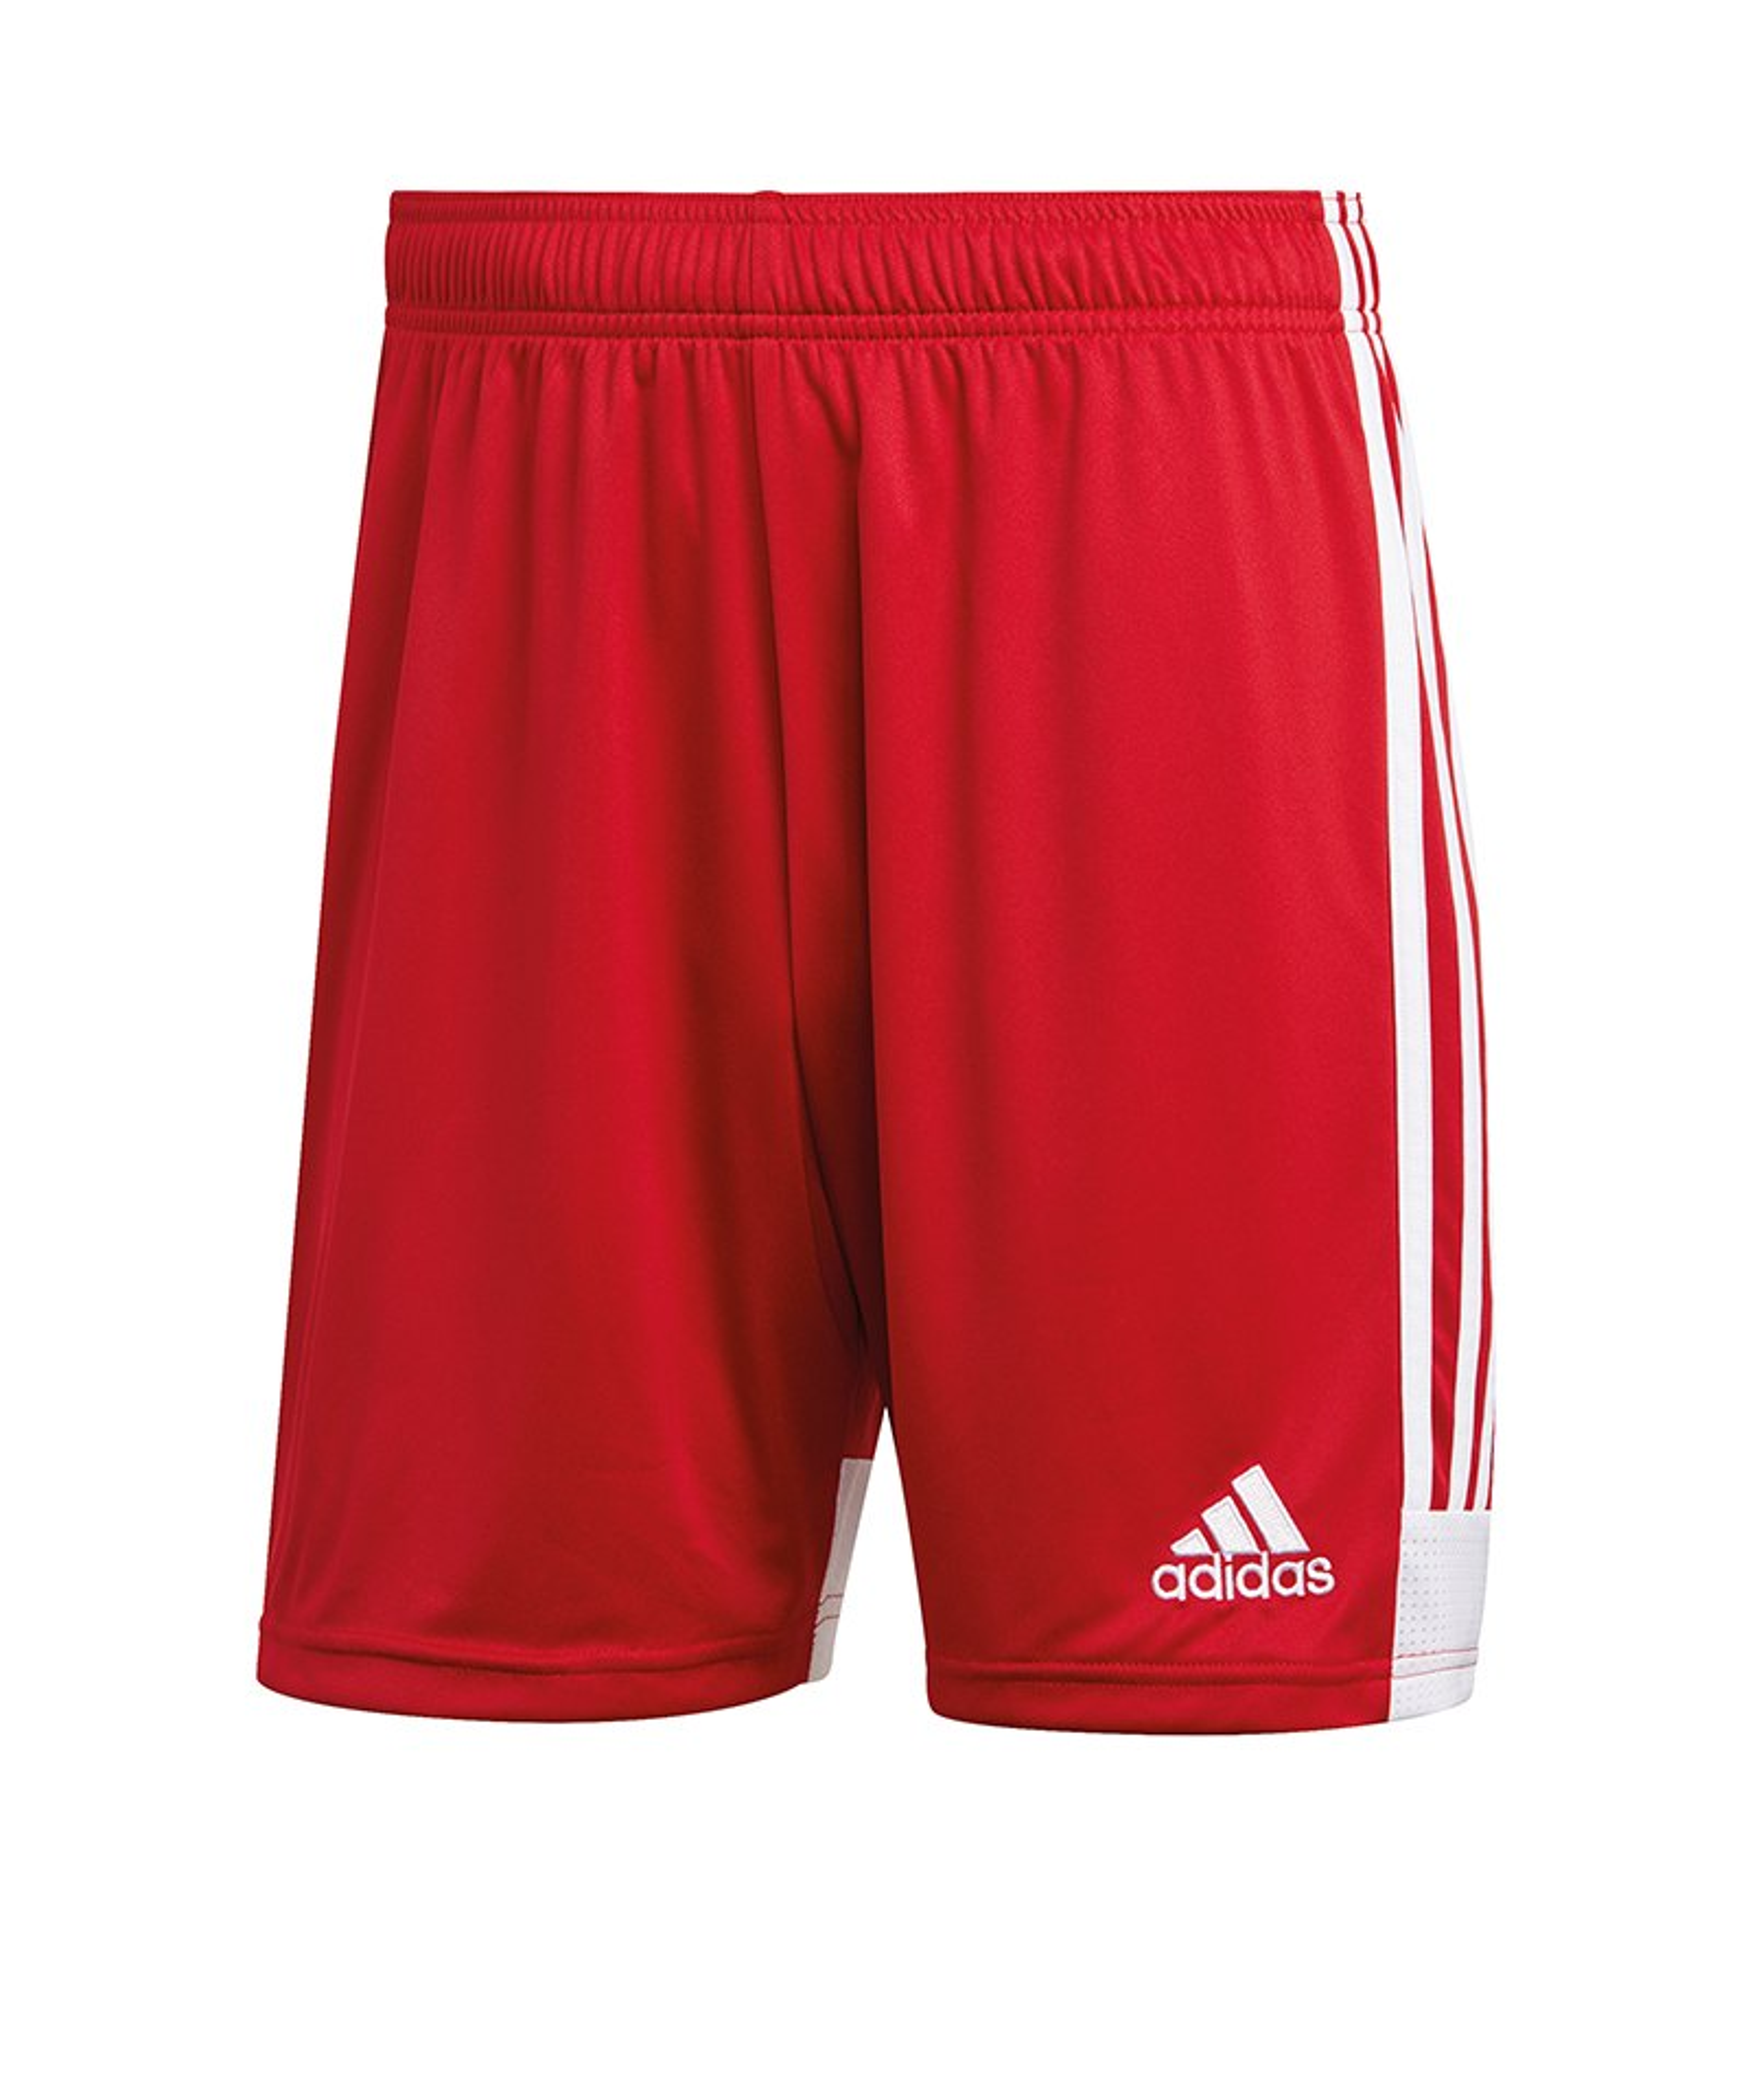 adidas Tastigo 19 Short ohne Innenslip Rot Weiss - rot